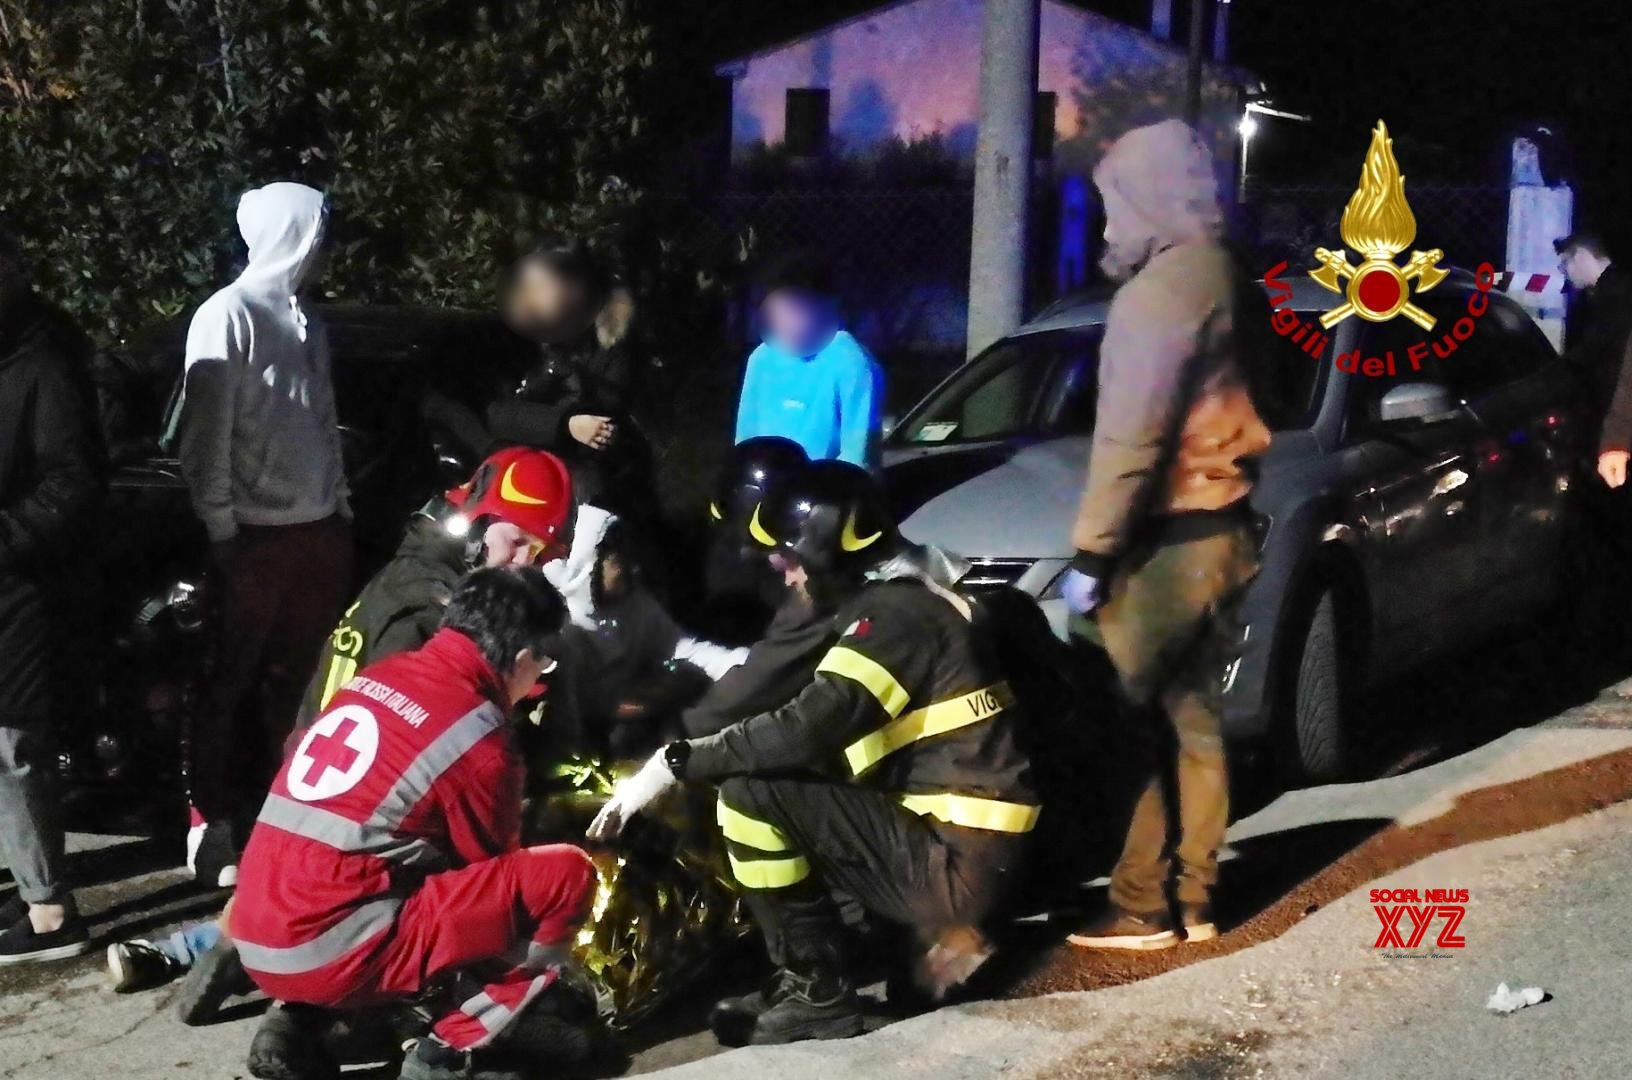 Italy nightclub stampede kills 6